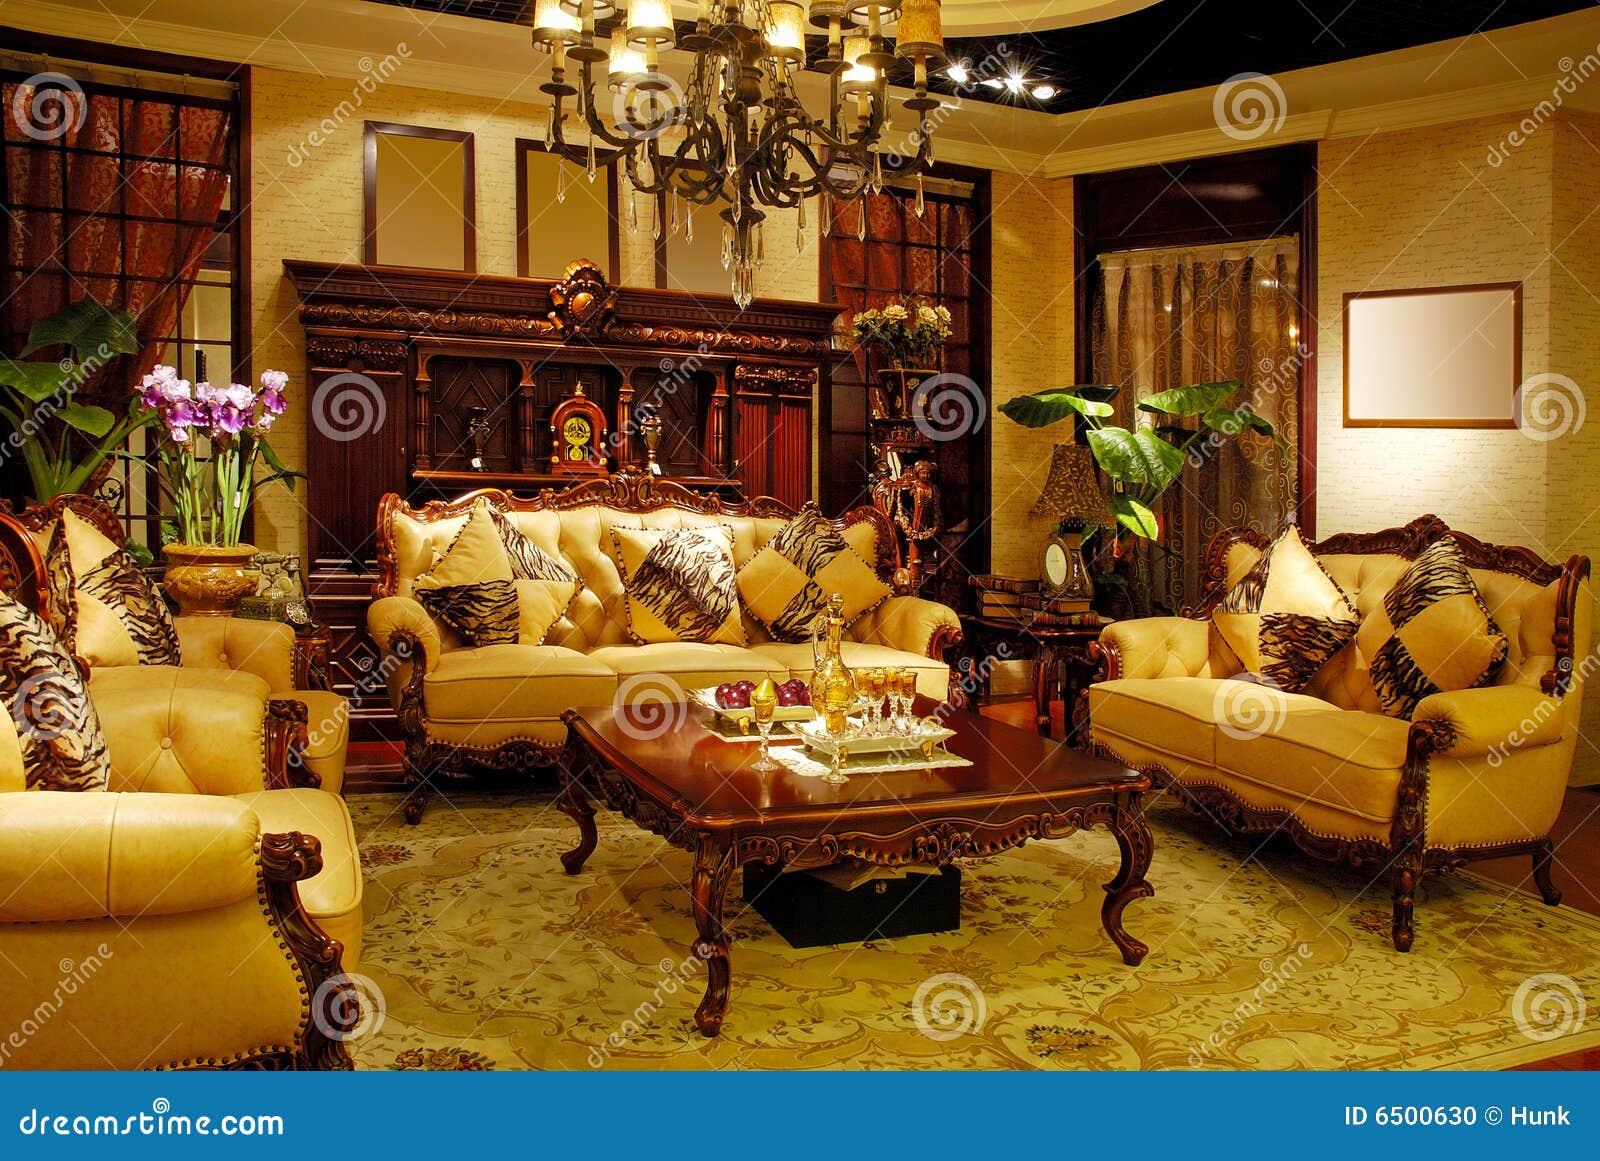 Matching Antique Furniture Stock Photo Image 6500630